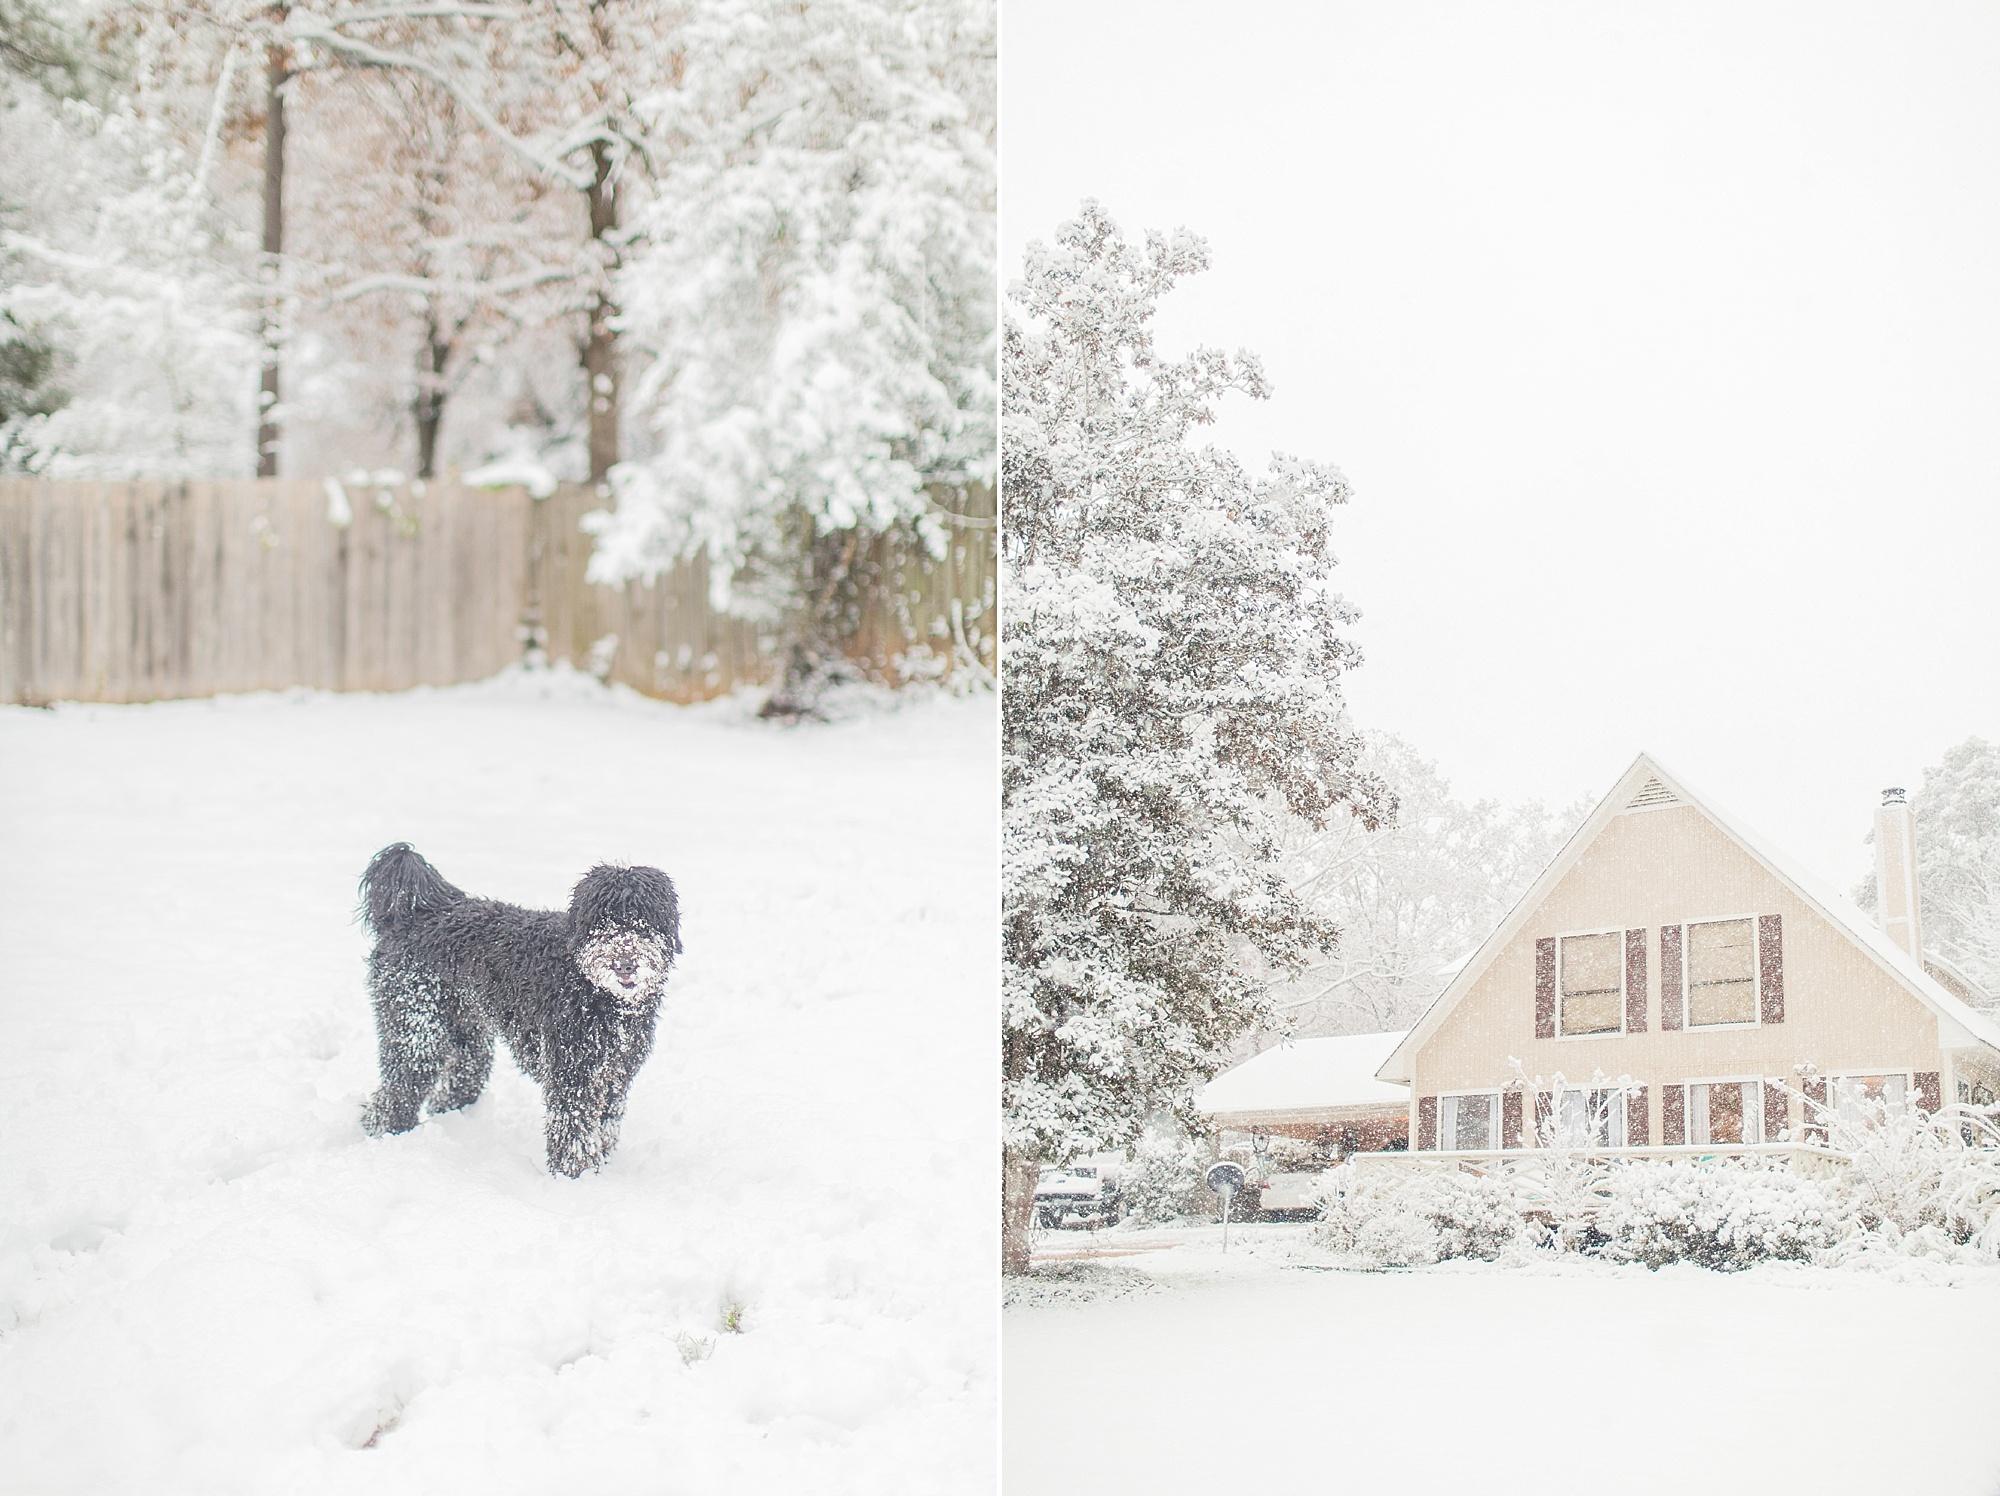 mississippi-snow-day_0005.jpg